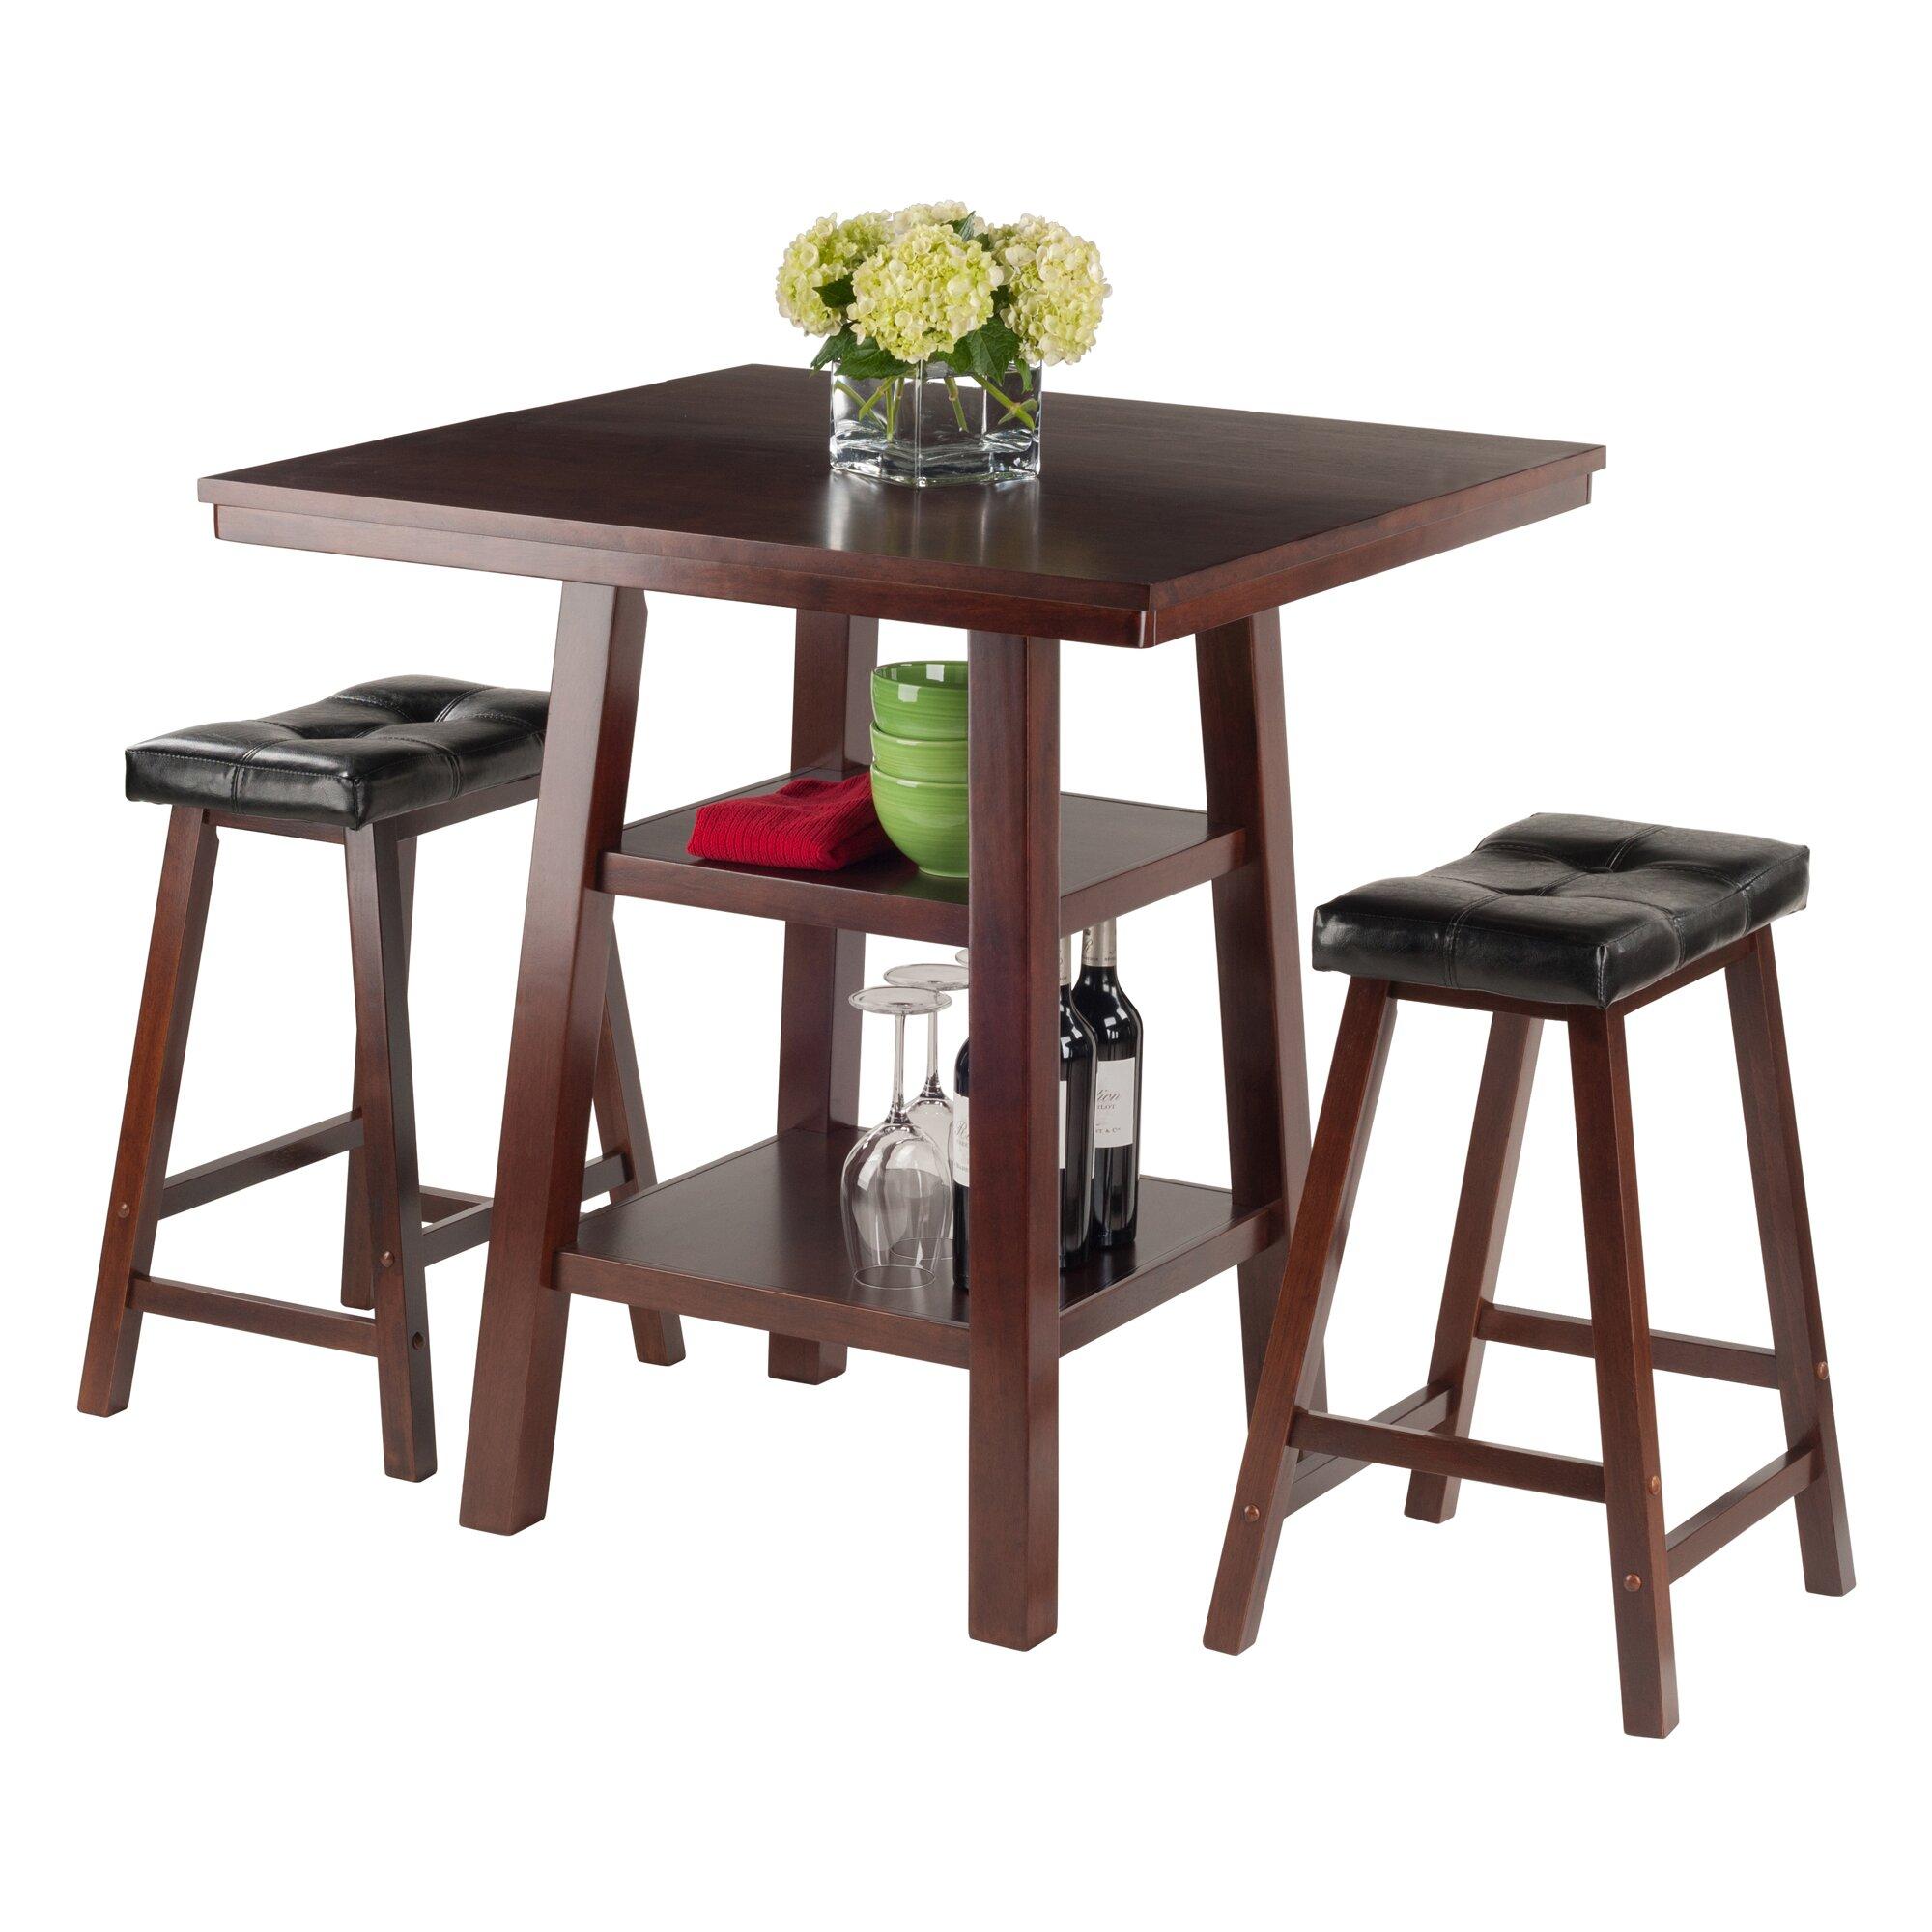 Red barrel studio pratt street 3 piece dining set wayfair for Dining room 3 piece set